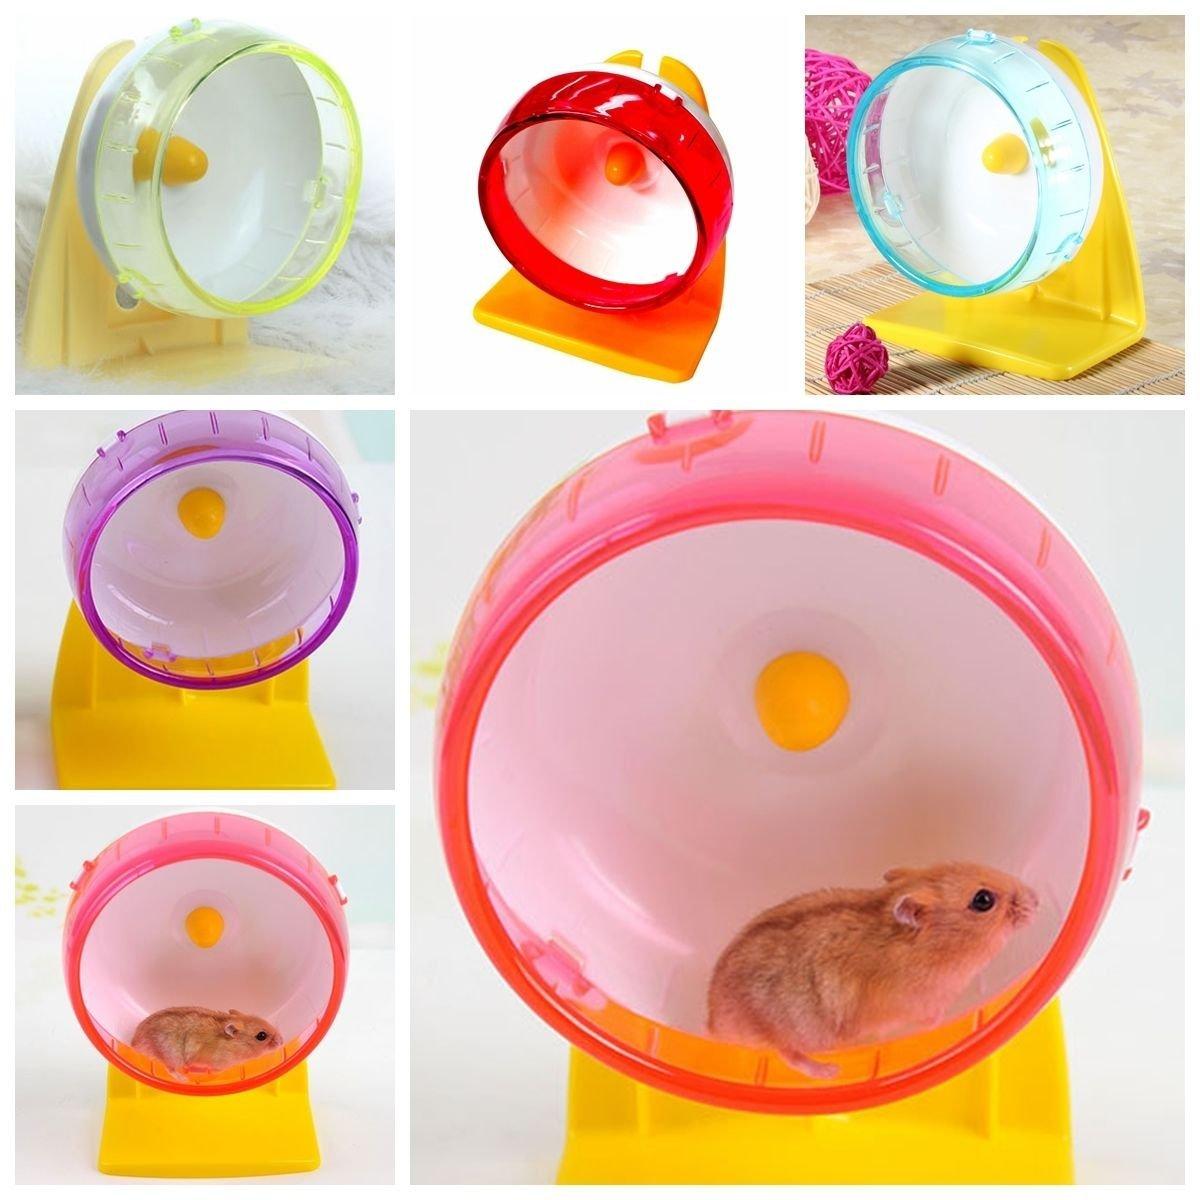 New Pet Rat Hamster Mouse Mute Exercise Running Wheel + Stable Bracket Toy Plastic